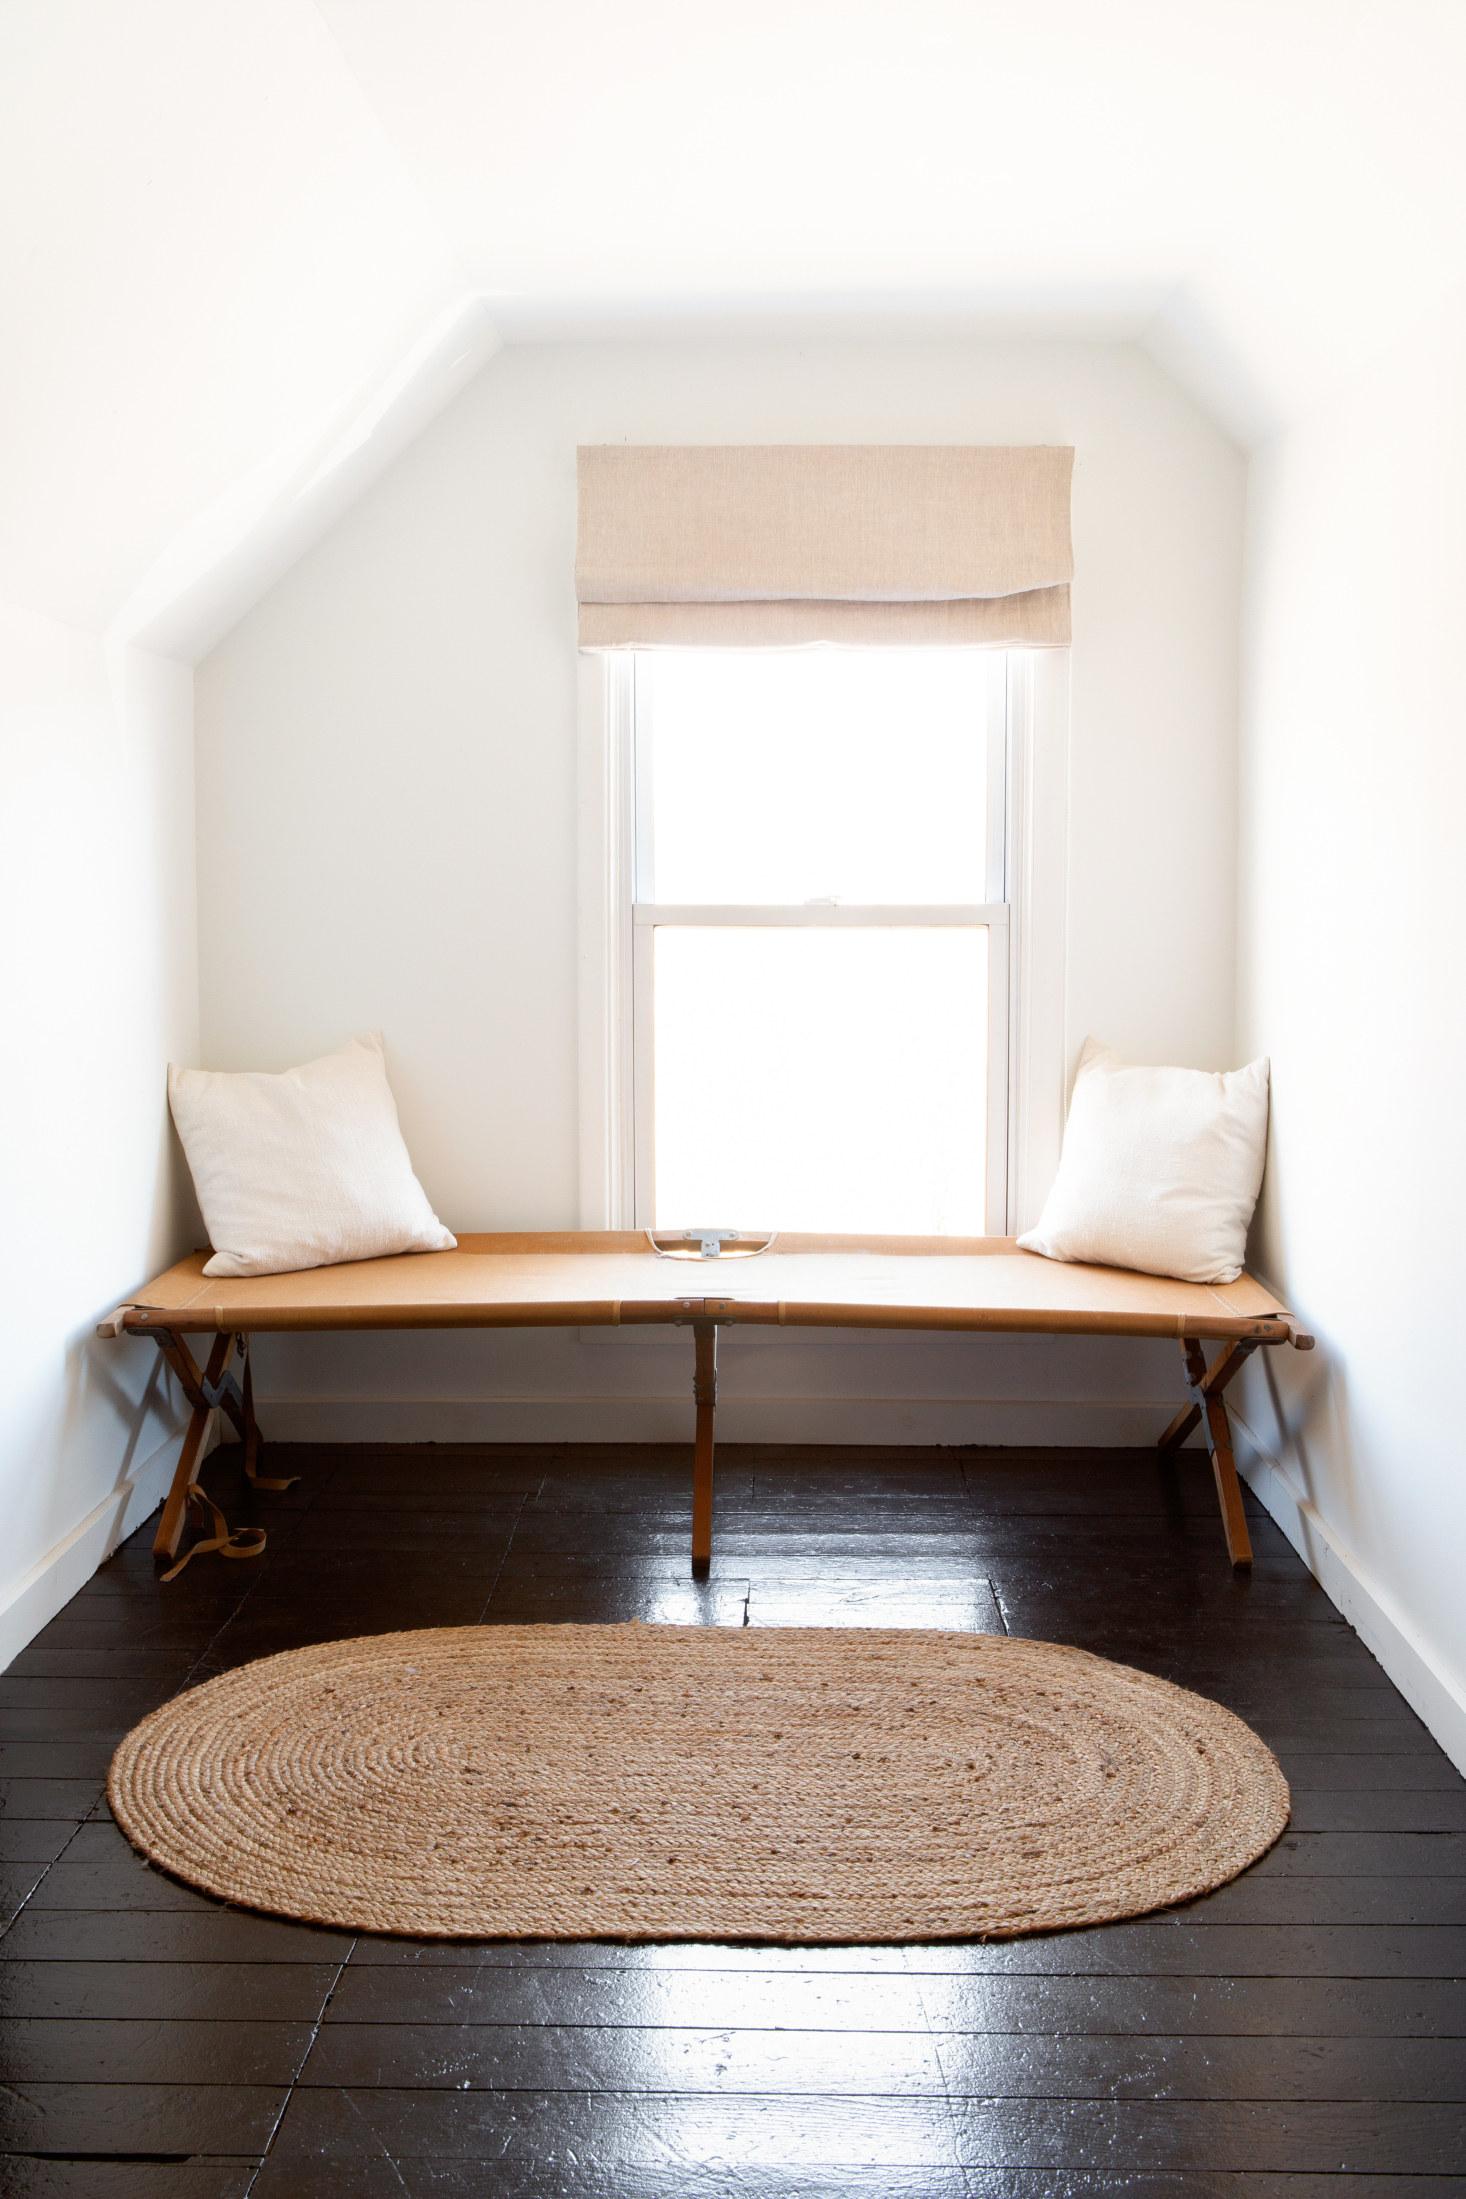 lisa-przystup-attic-camp-cot-sarah-elliott-1466x2199.jpg